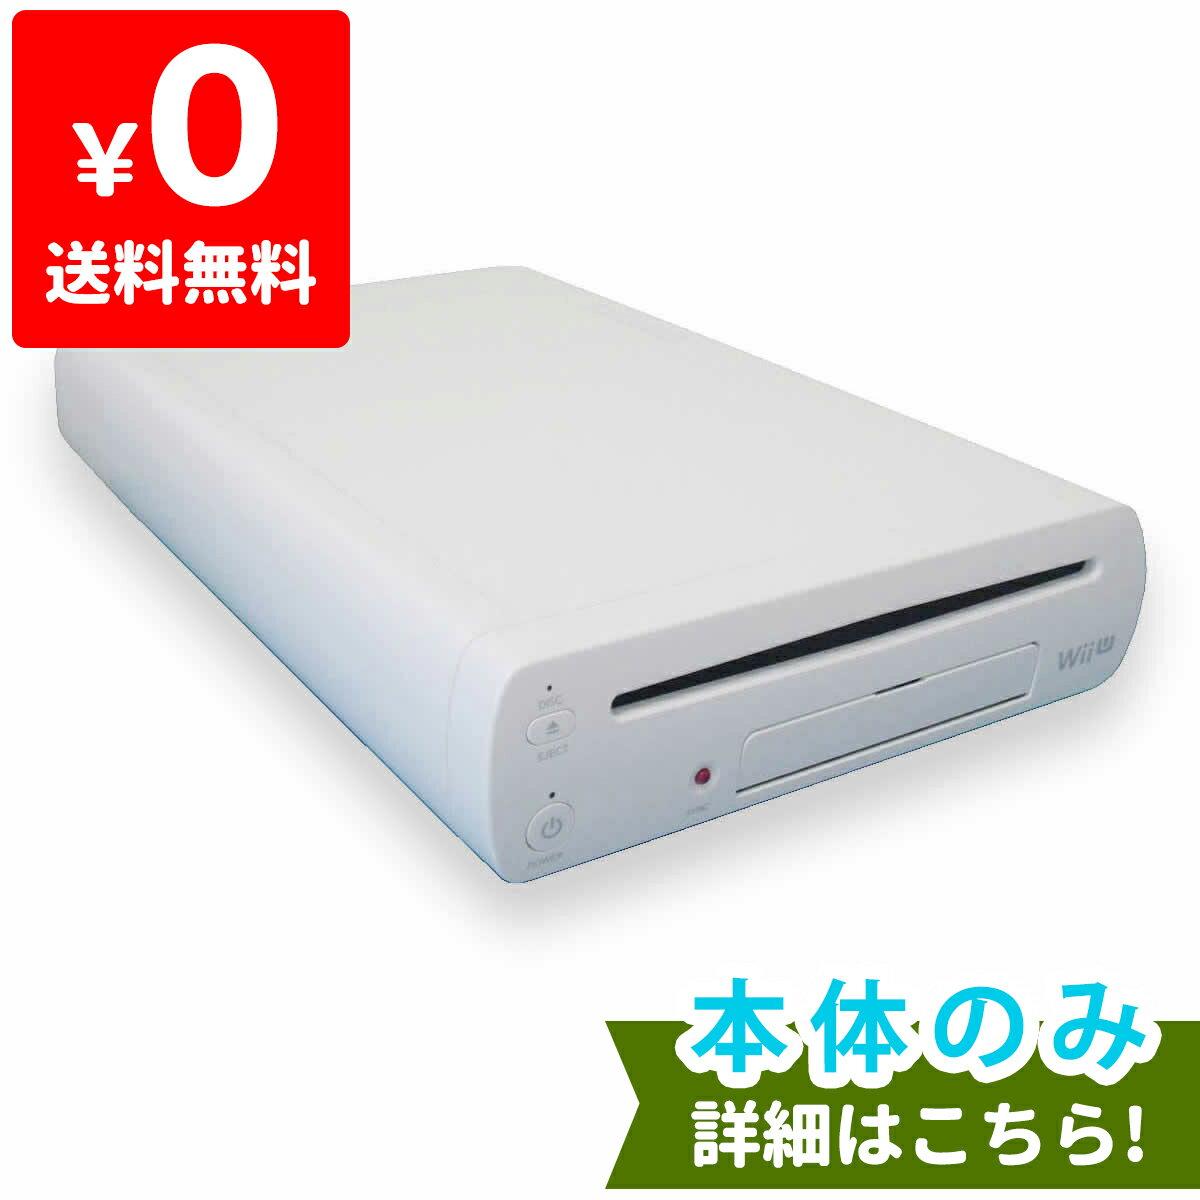 WiiU ニンテンドーWiiU Wii U ベーシックセット本体のみ 本体単品 Nintendo 任天堂 ニンテンドー 中古 4902370519877 送料無料 【中古】